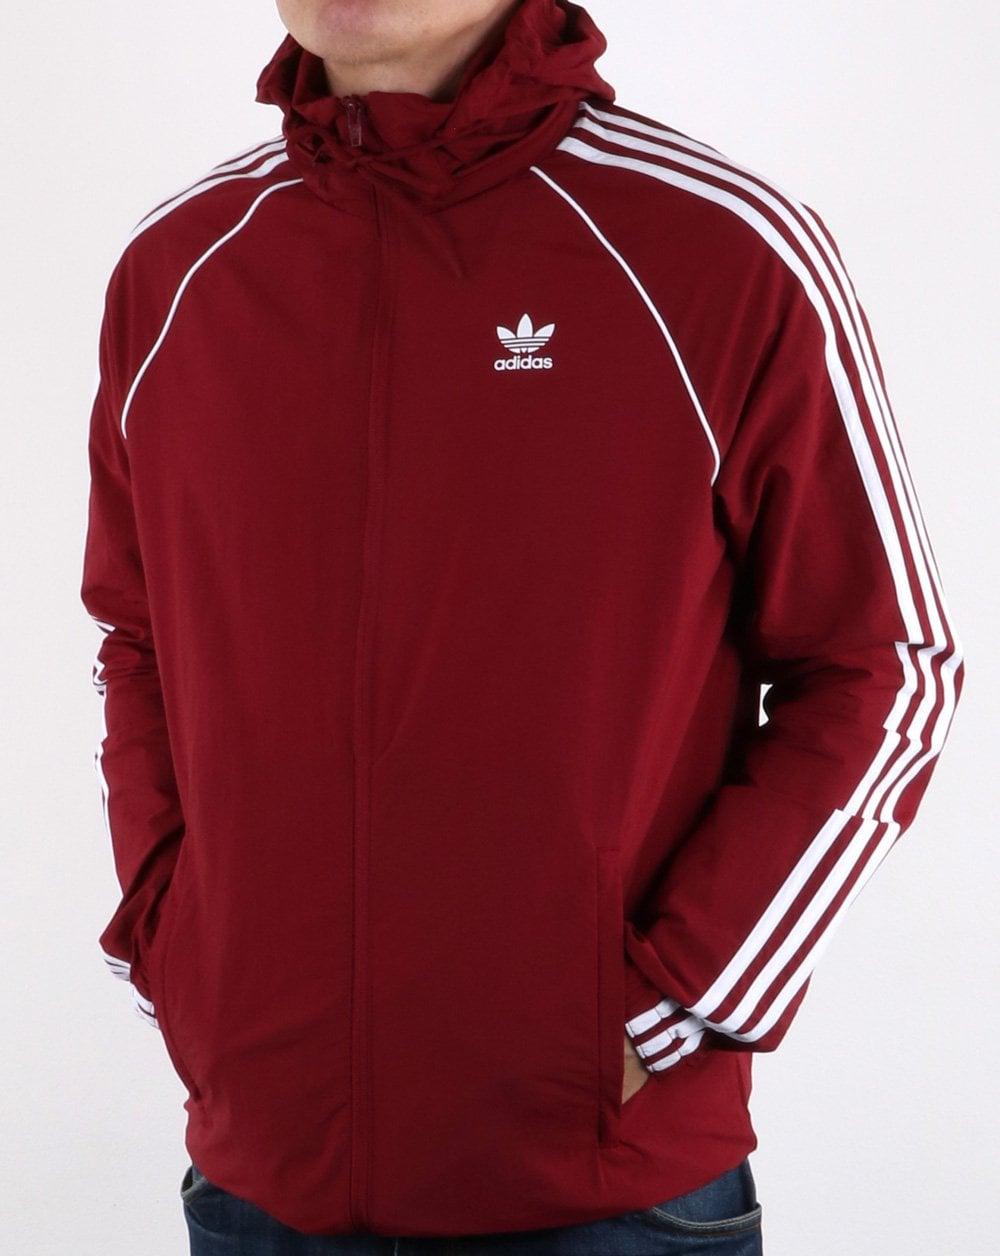 Adidas Originals Superstar Windbreaker